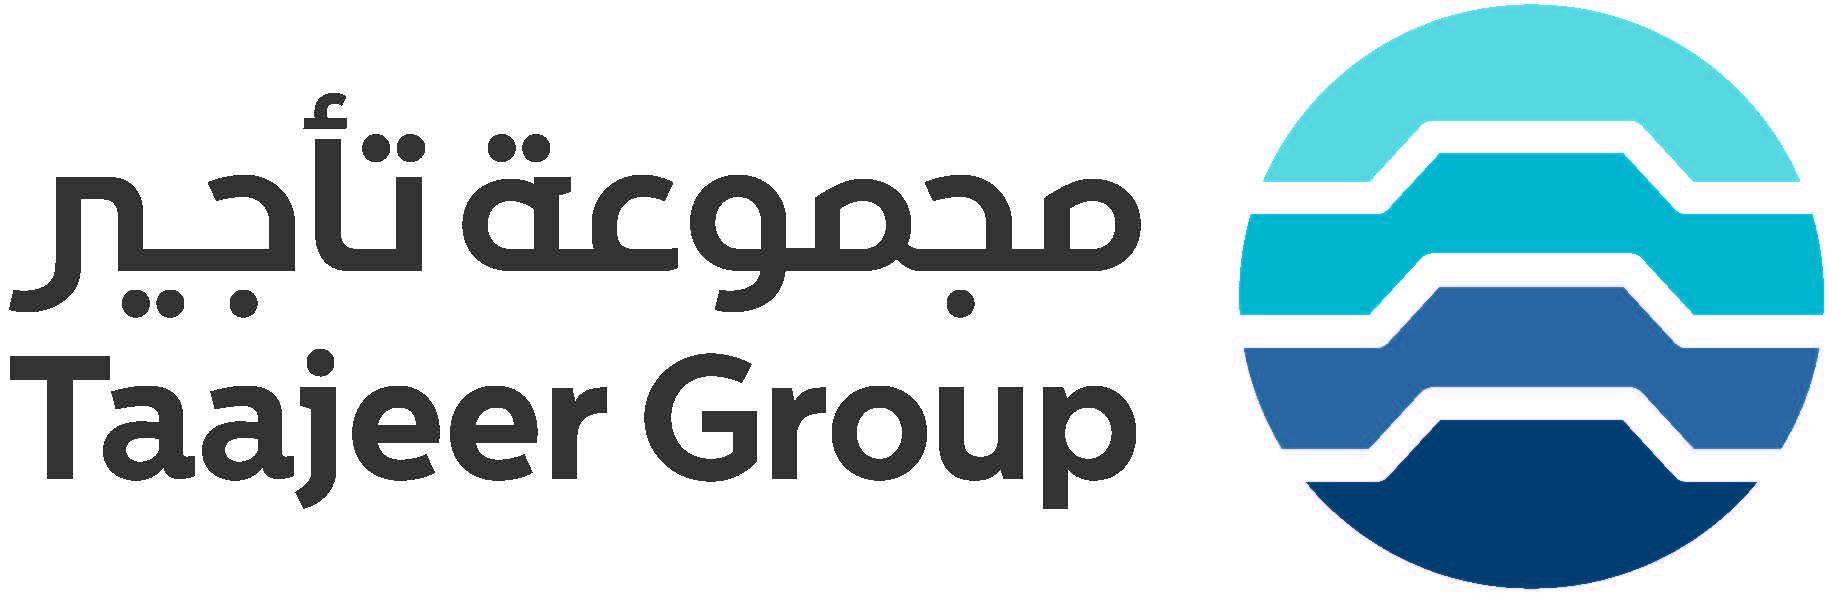 taajer group_cmyk_logo.jpg